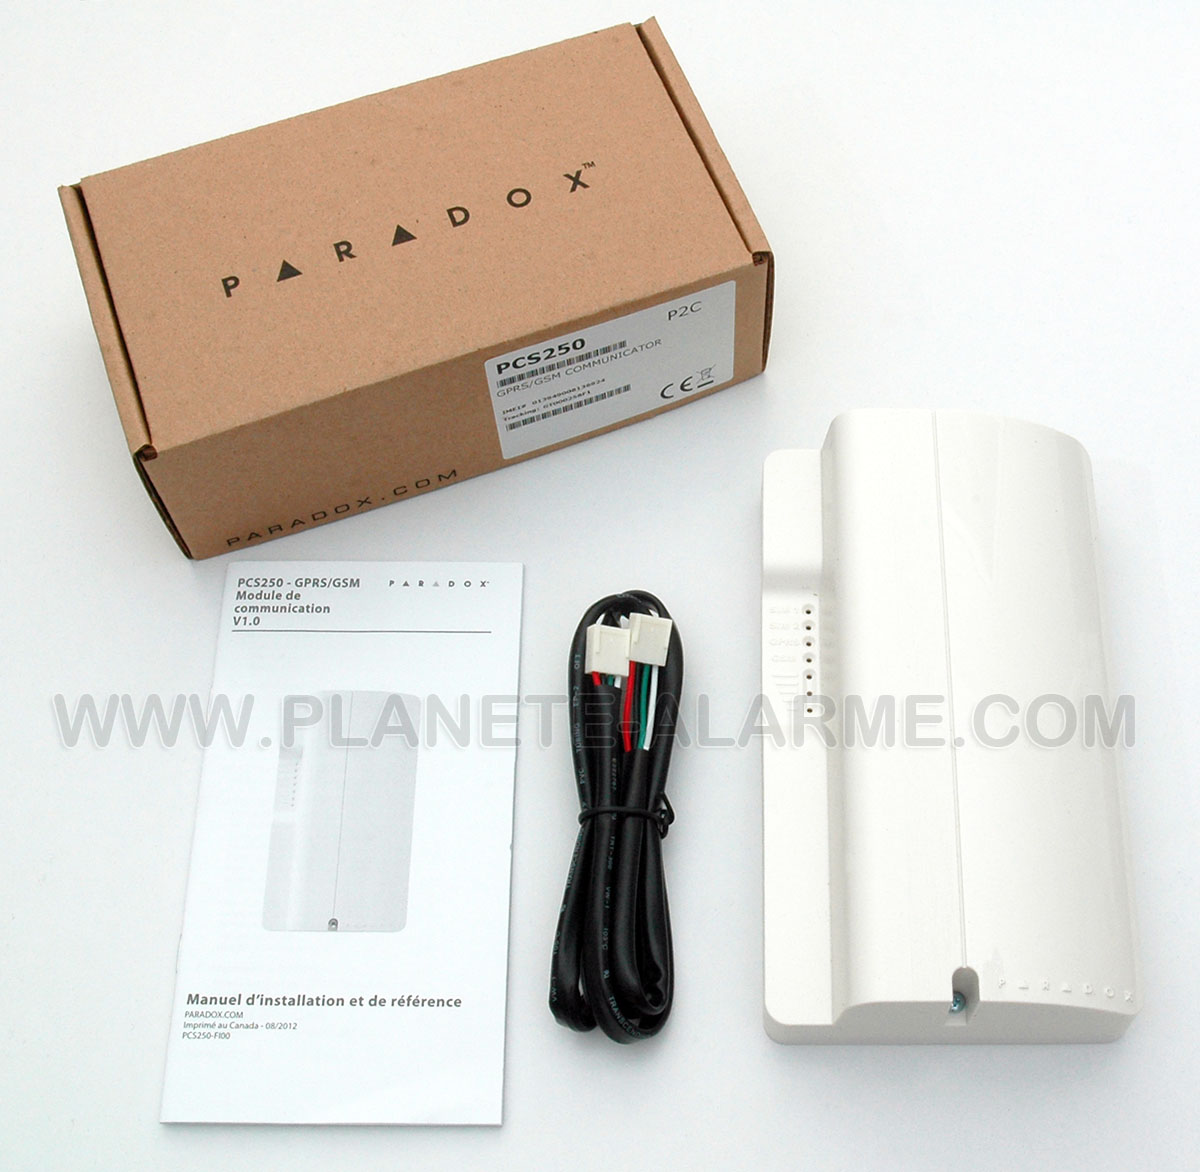 Contenu du pack Paradox PCS250 GSM / GPRS